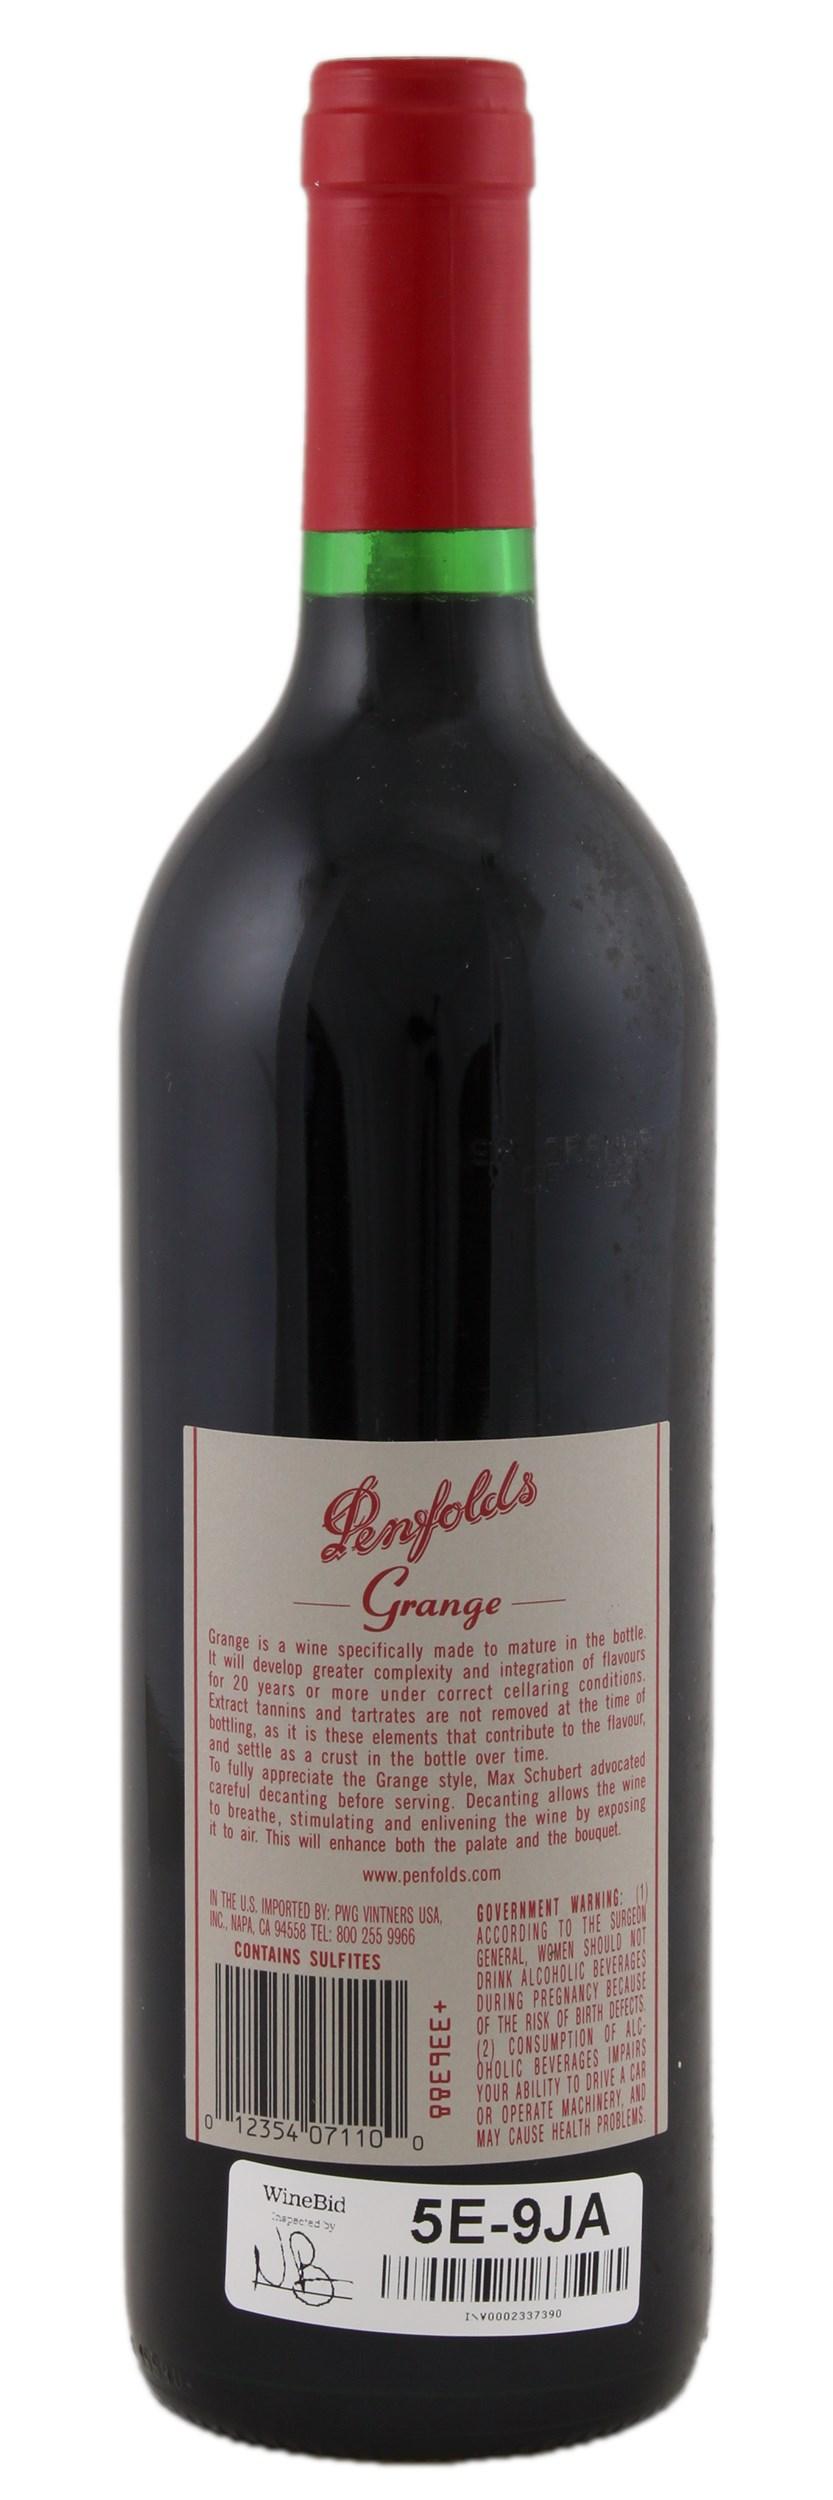 Penfolds Grange 1998 Red Wine From Australia Winebid